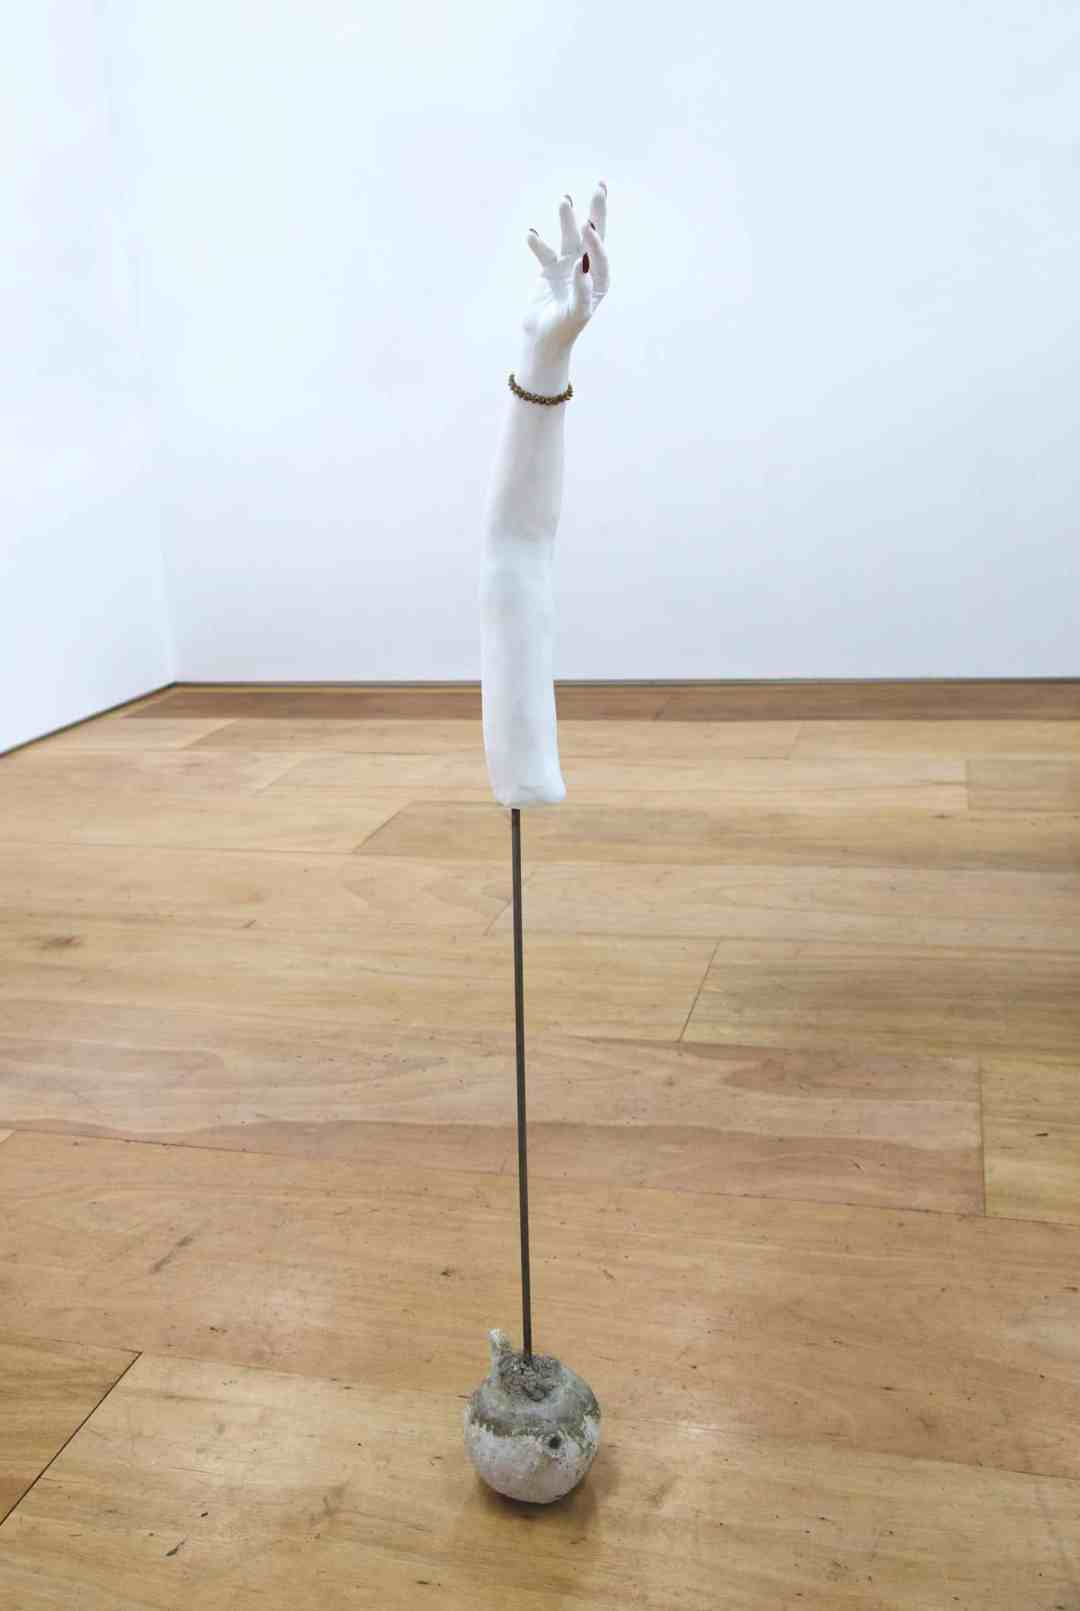 Anna Perach, Hand,155×29cm, Plaster, metal pole, cement, nail polish, porcelain, baby teeth casting, 2017